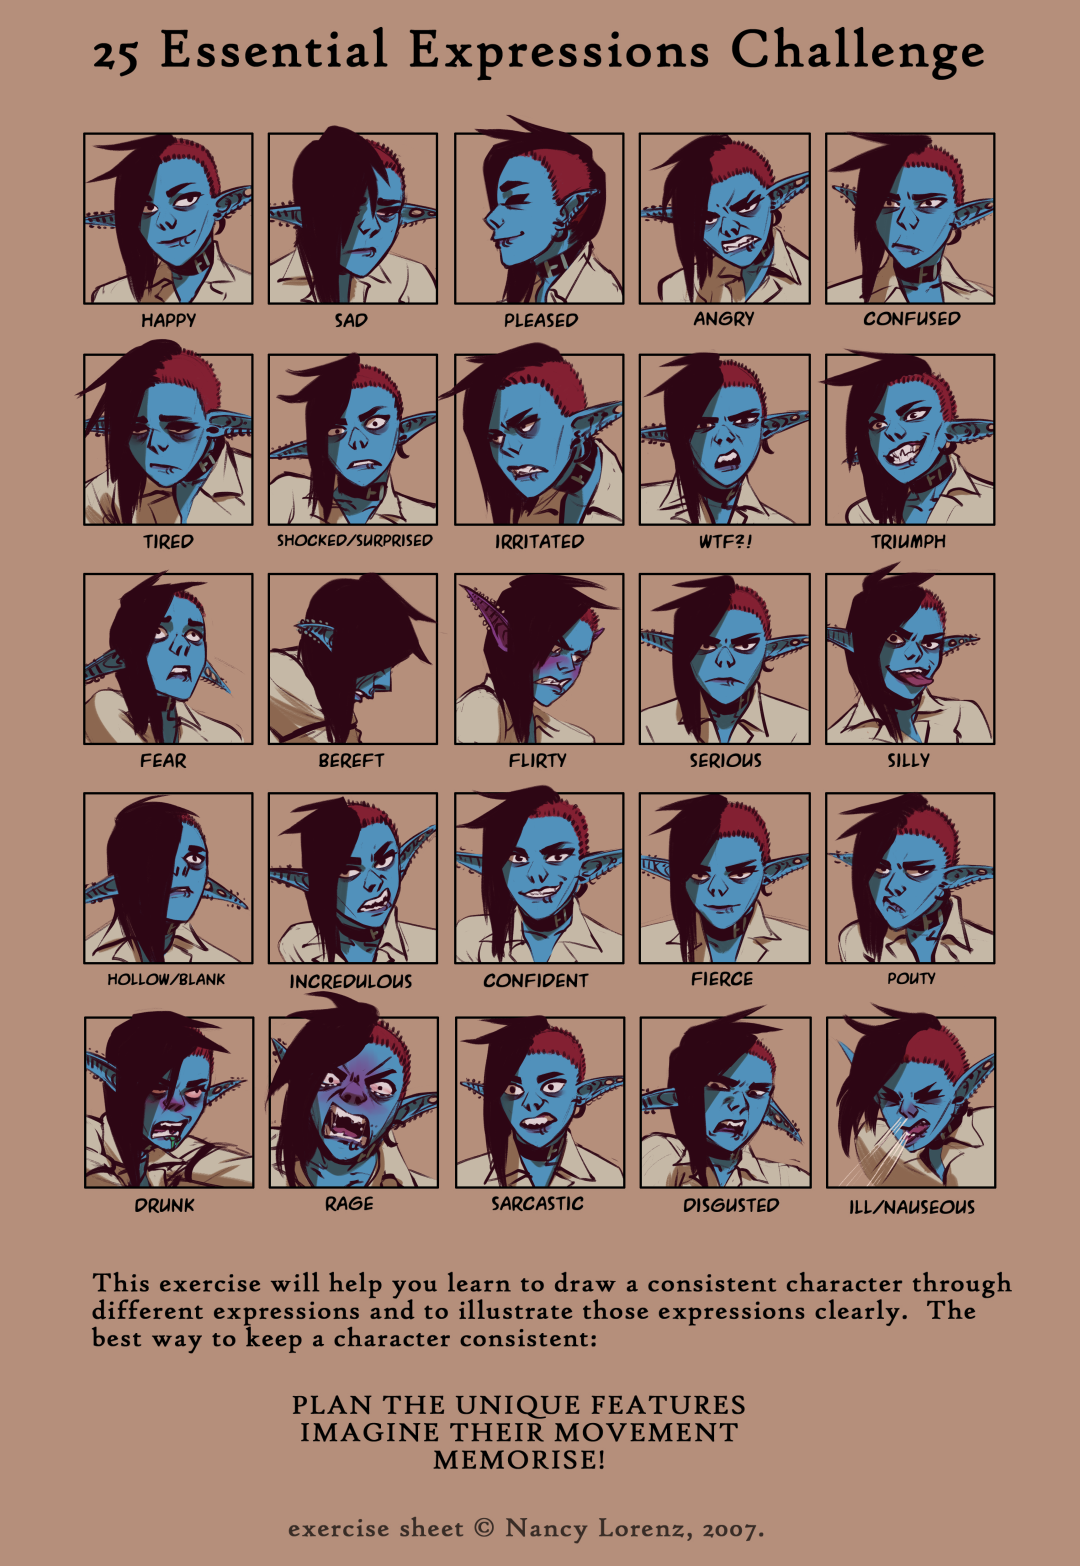 Ryybyn Expressions Meme by MisterCrowbar